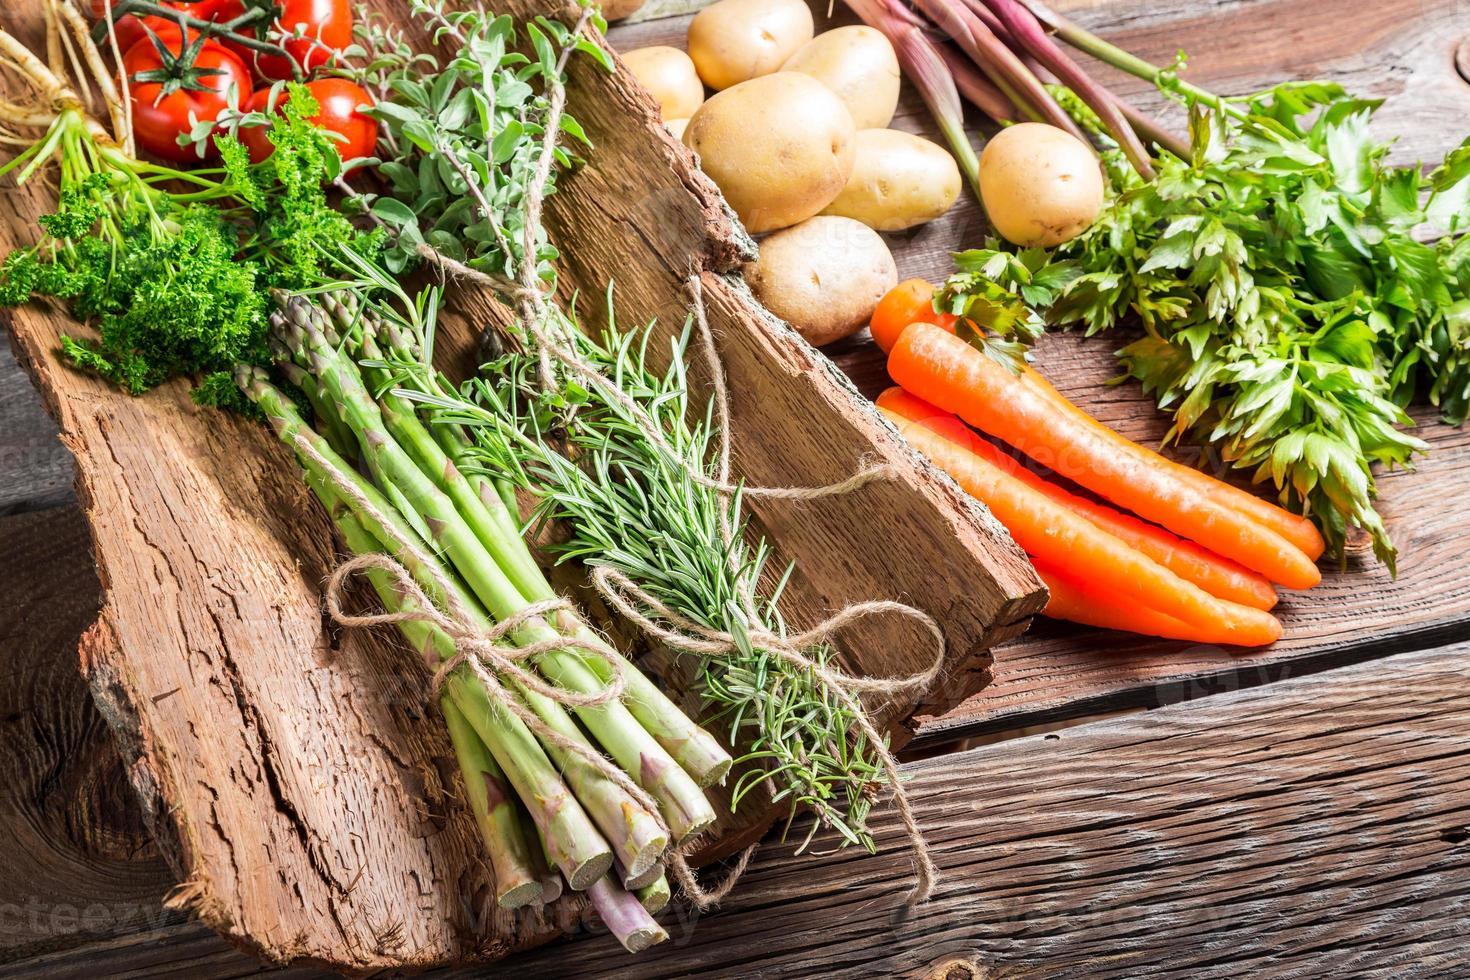 varie verdure fresche su corteccia foto